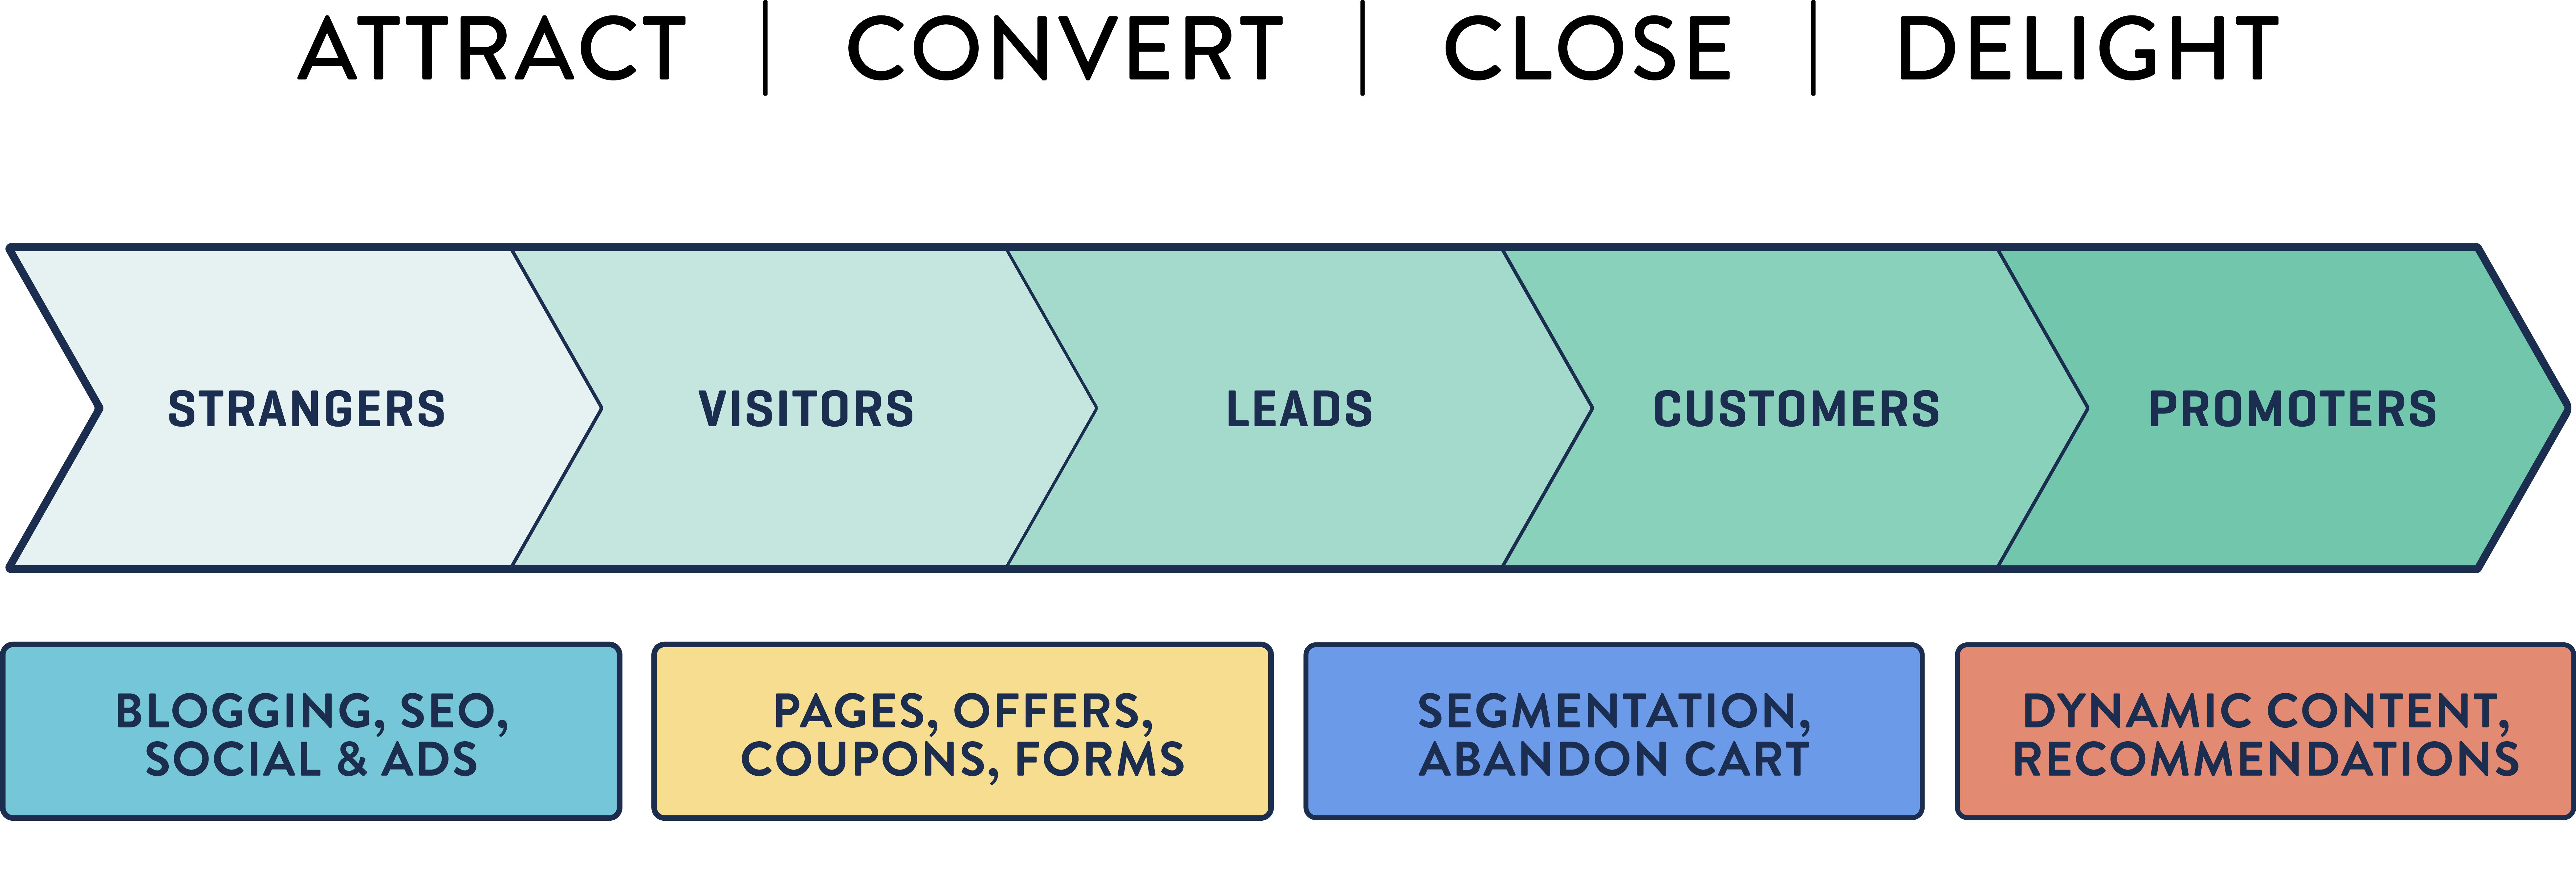 Ascend Ecommerce Customer Journey-992298-edited